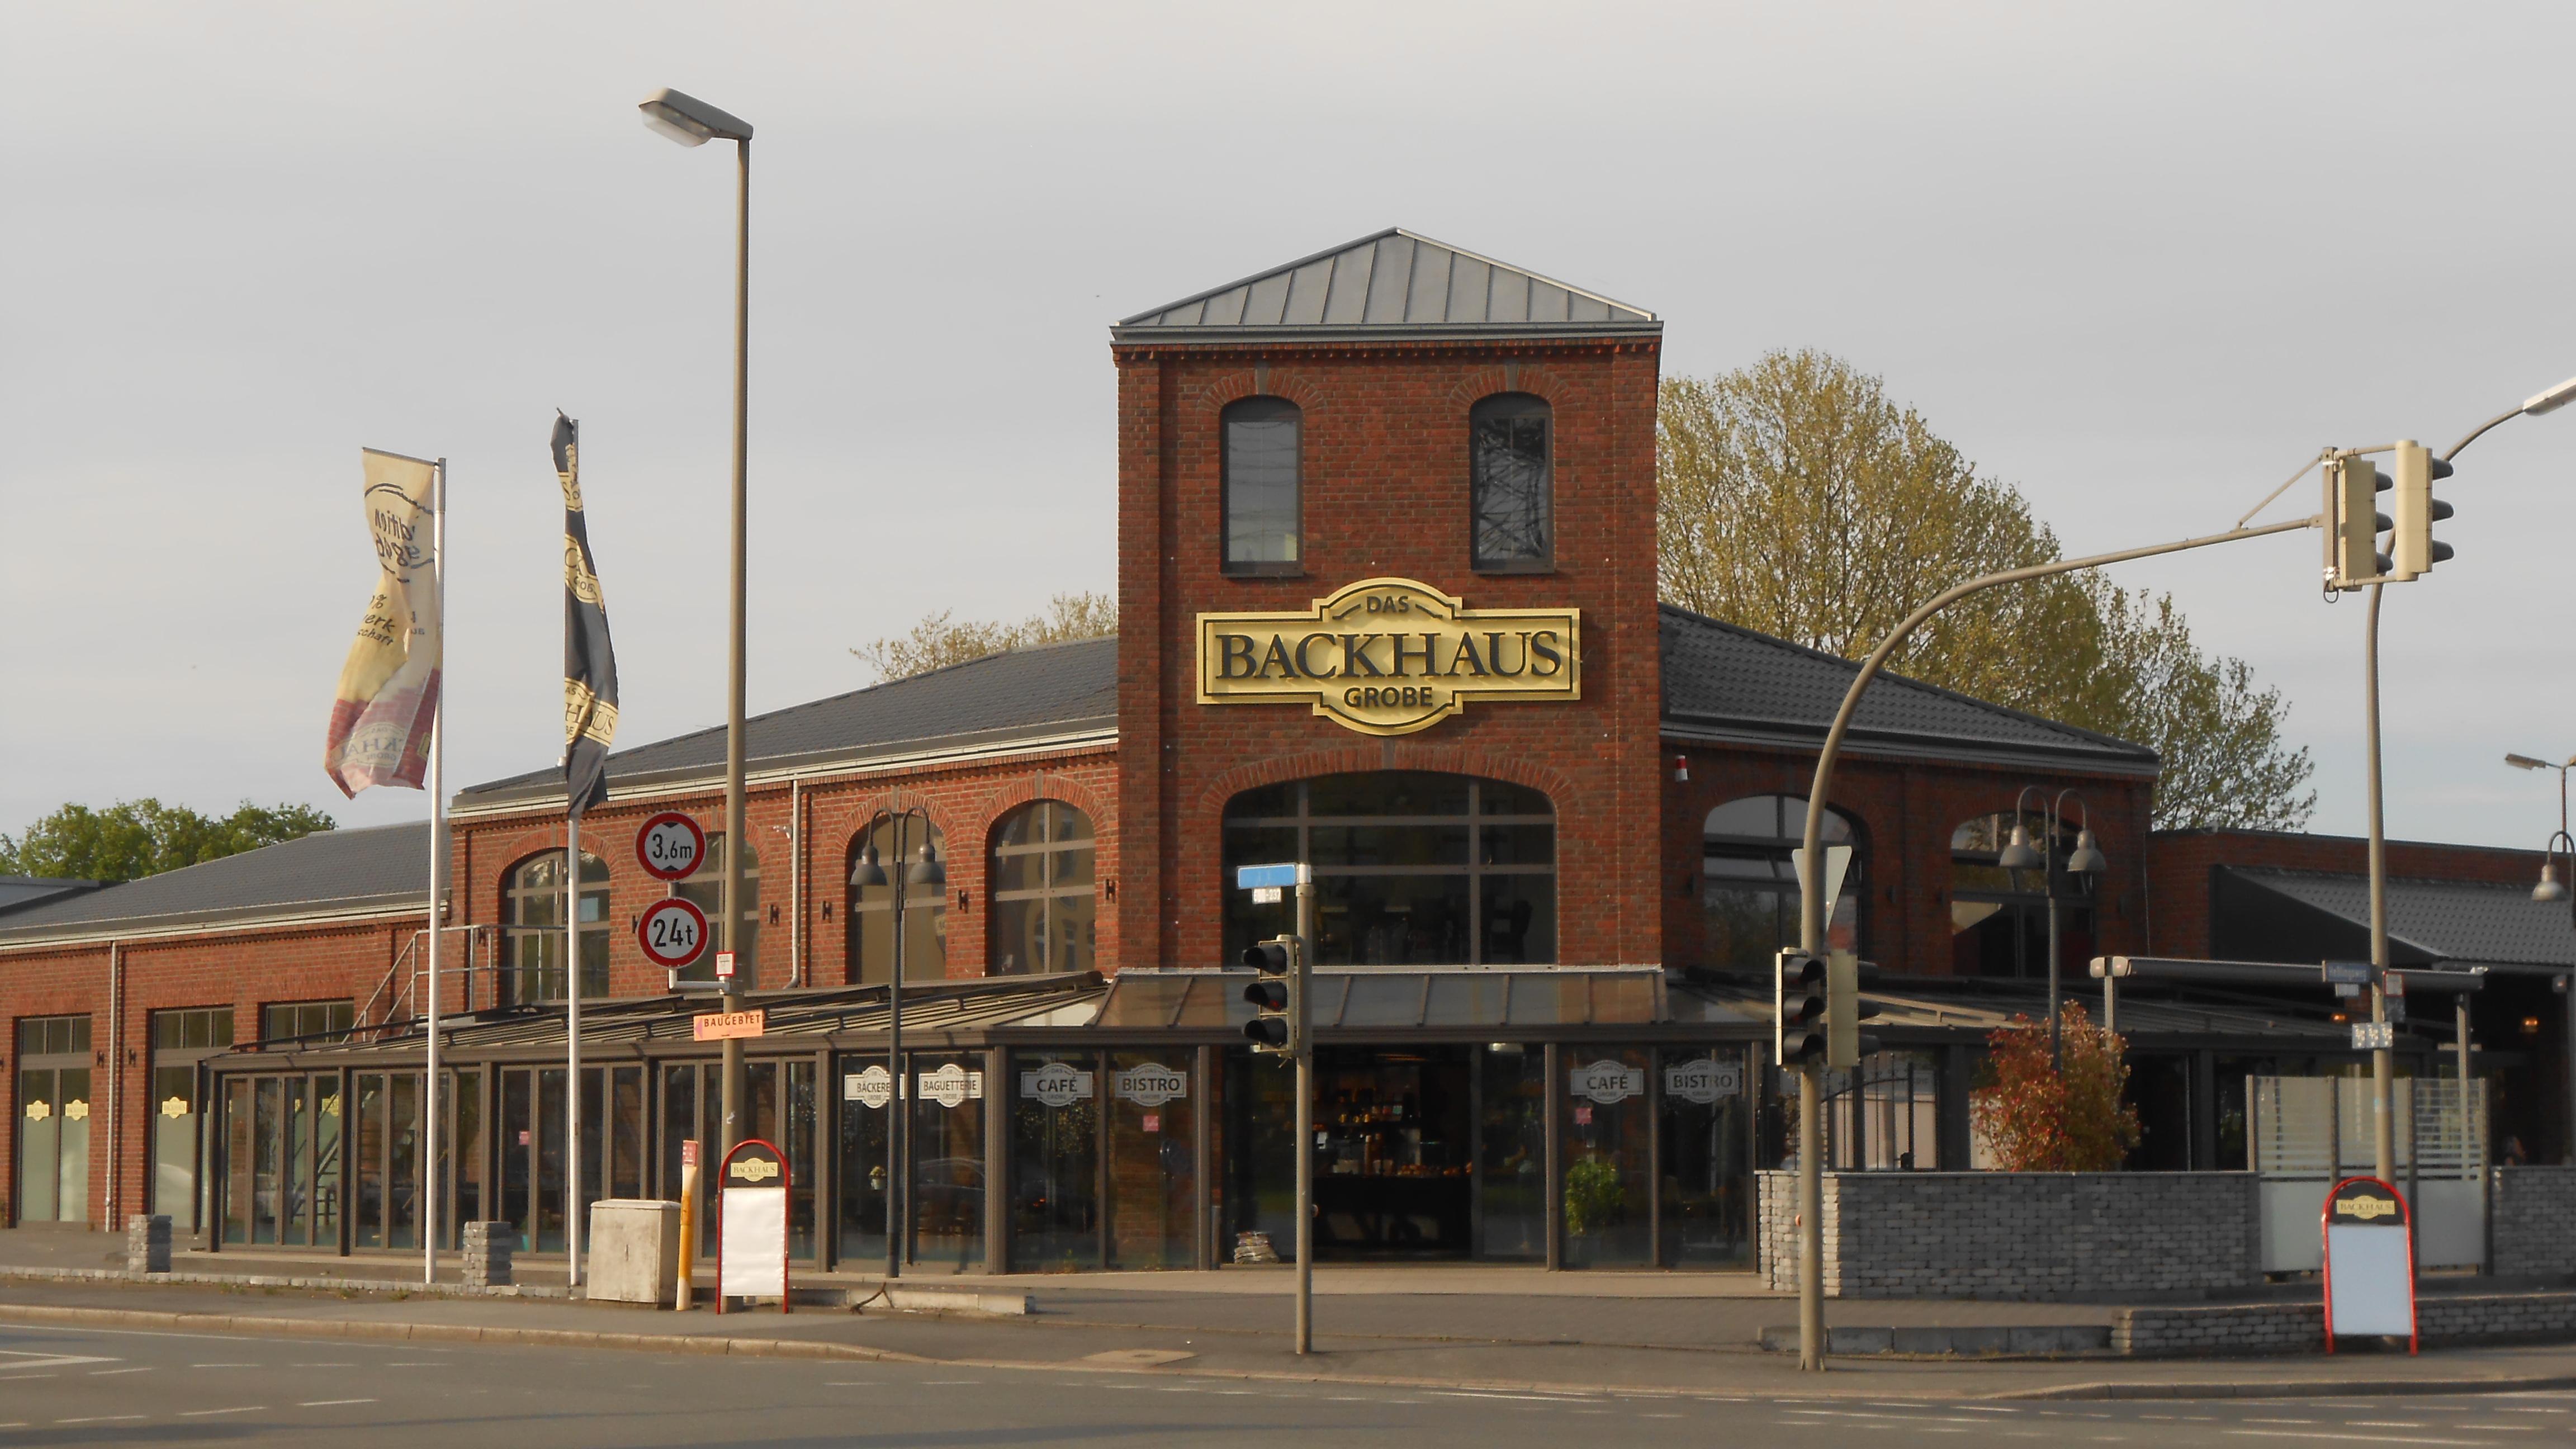 FileBackhaus Grobe Dortmund Brackel (1).JPG - Wikimedia Commons